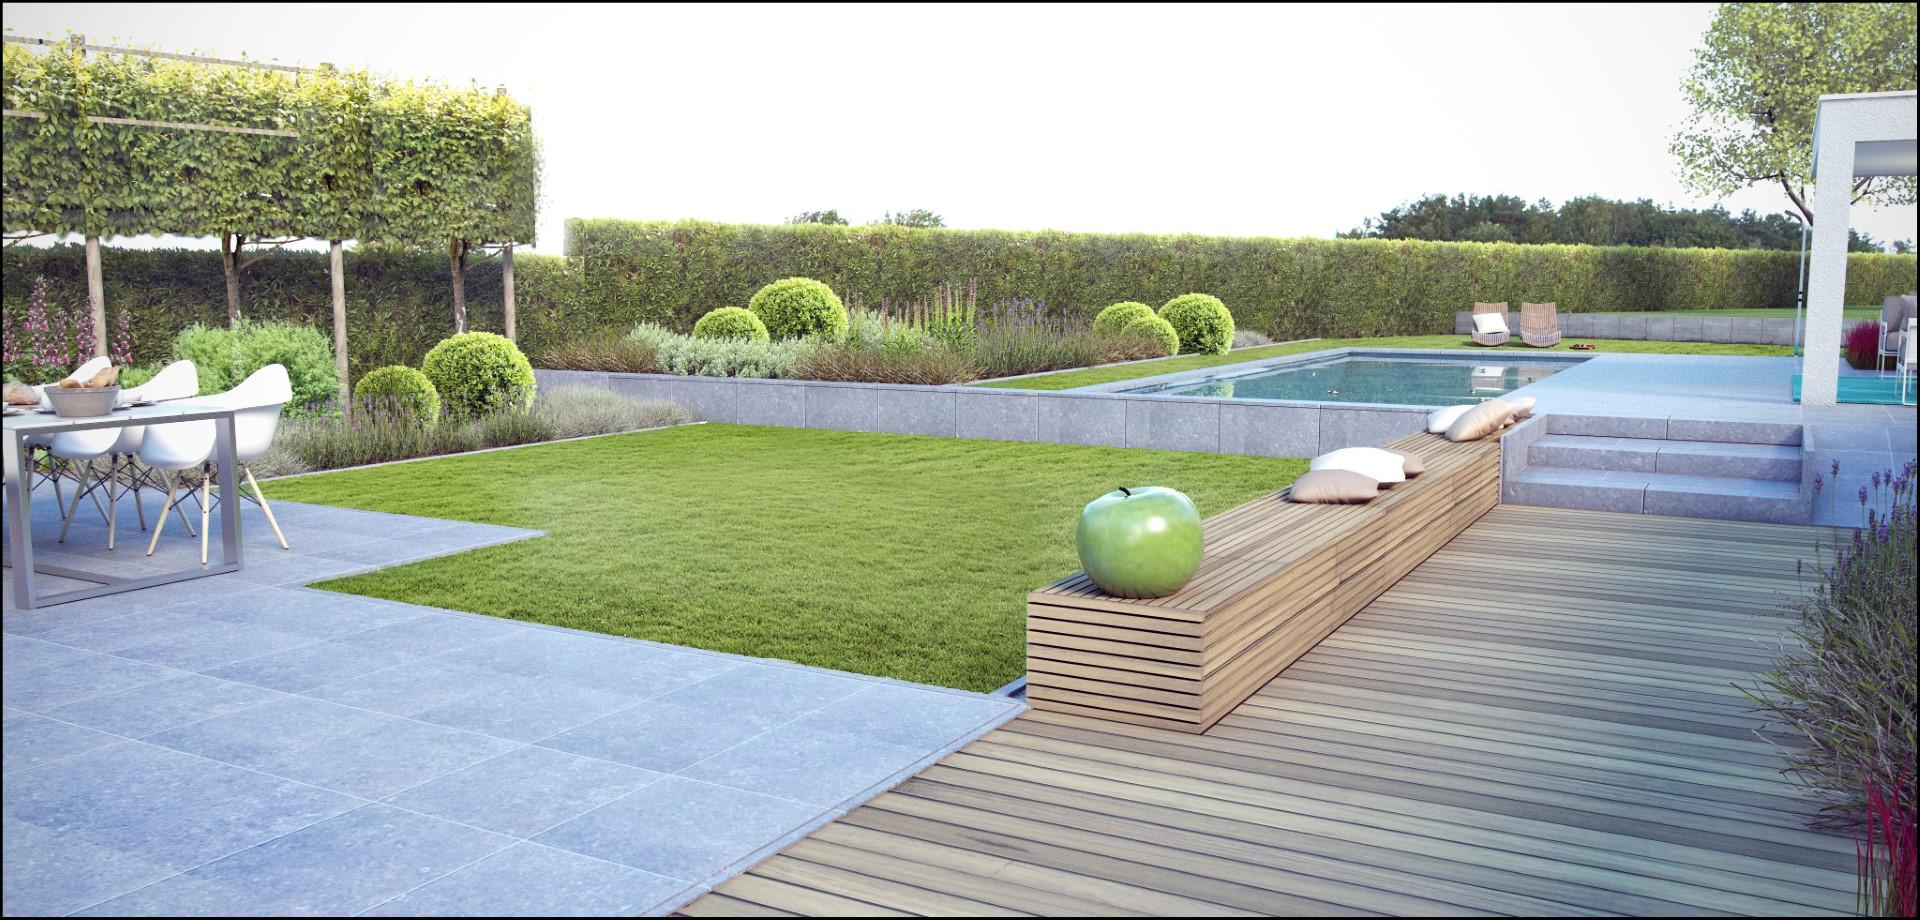 Eco tuinarchitectengroep 3d projecten zwembad poolhouse - Outs zwembad in de tuin ...